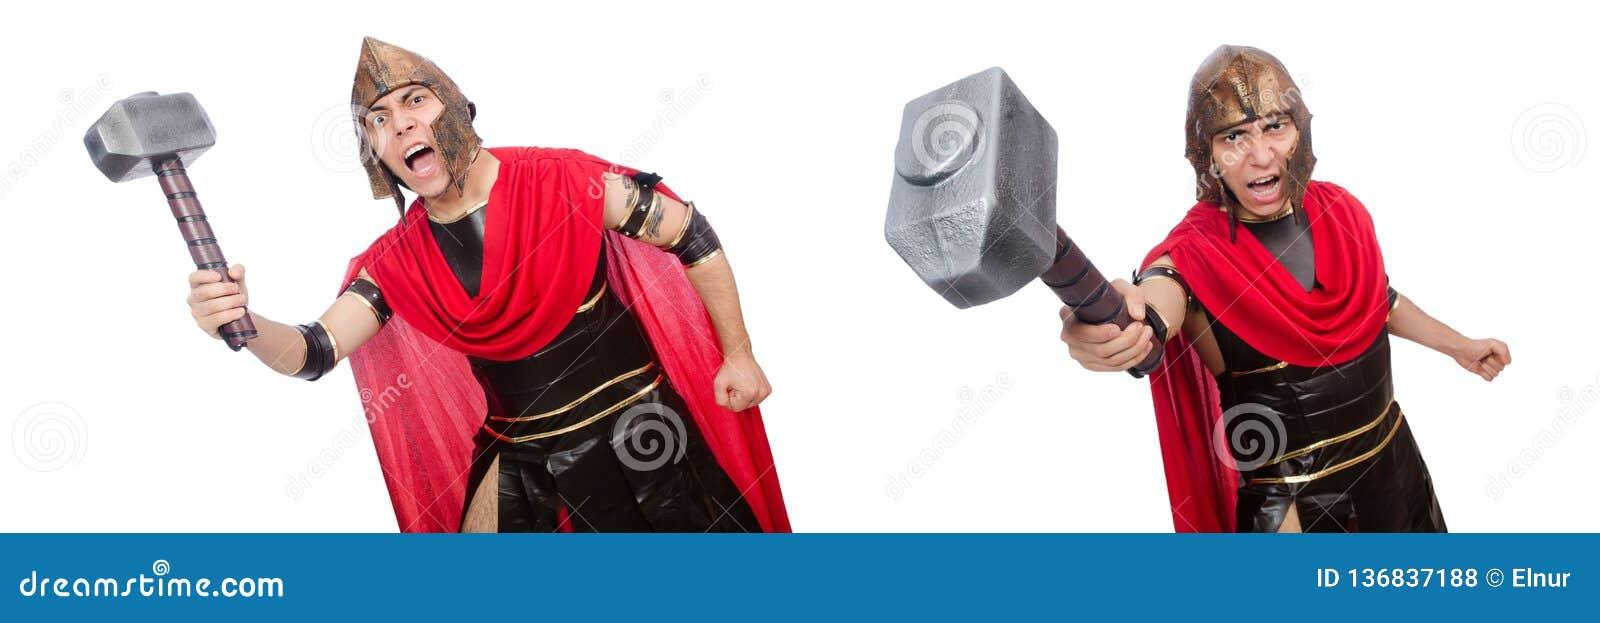 O gladiador isolado no branco